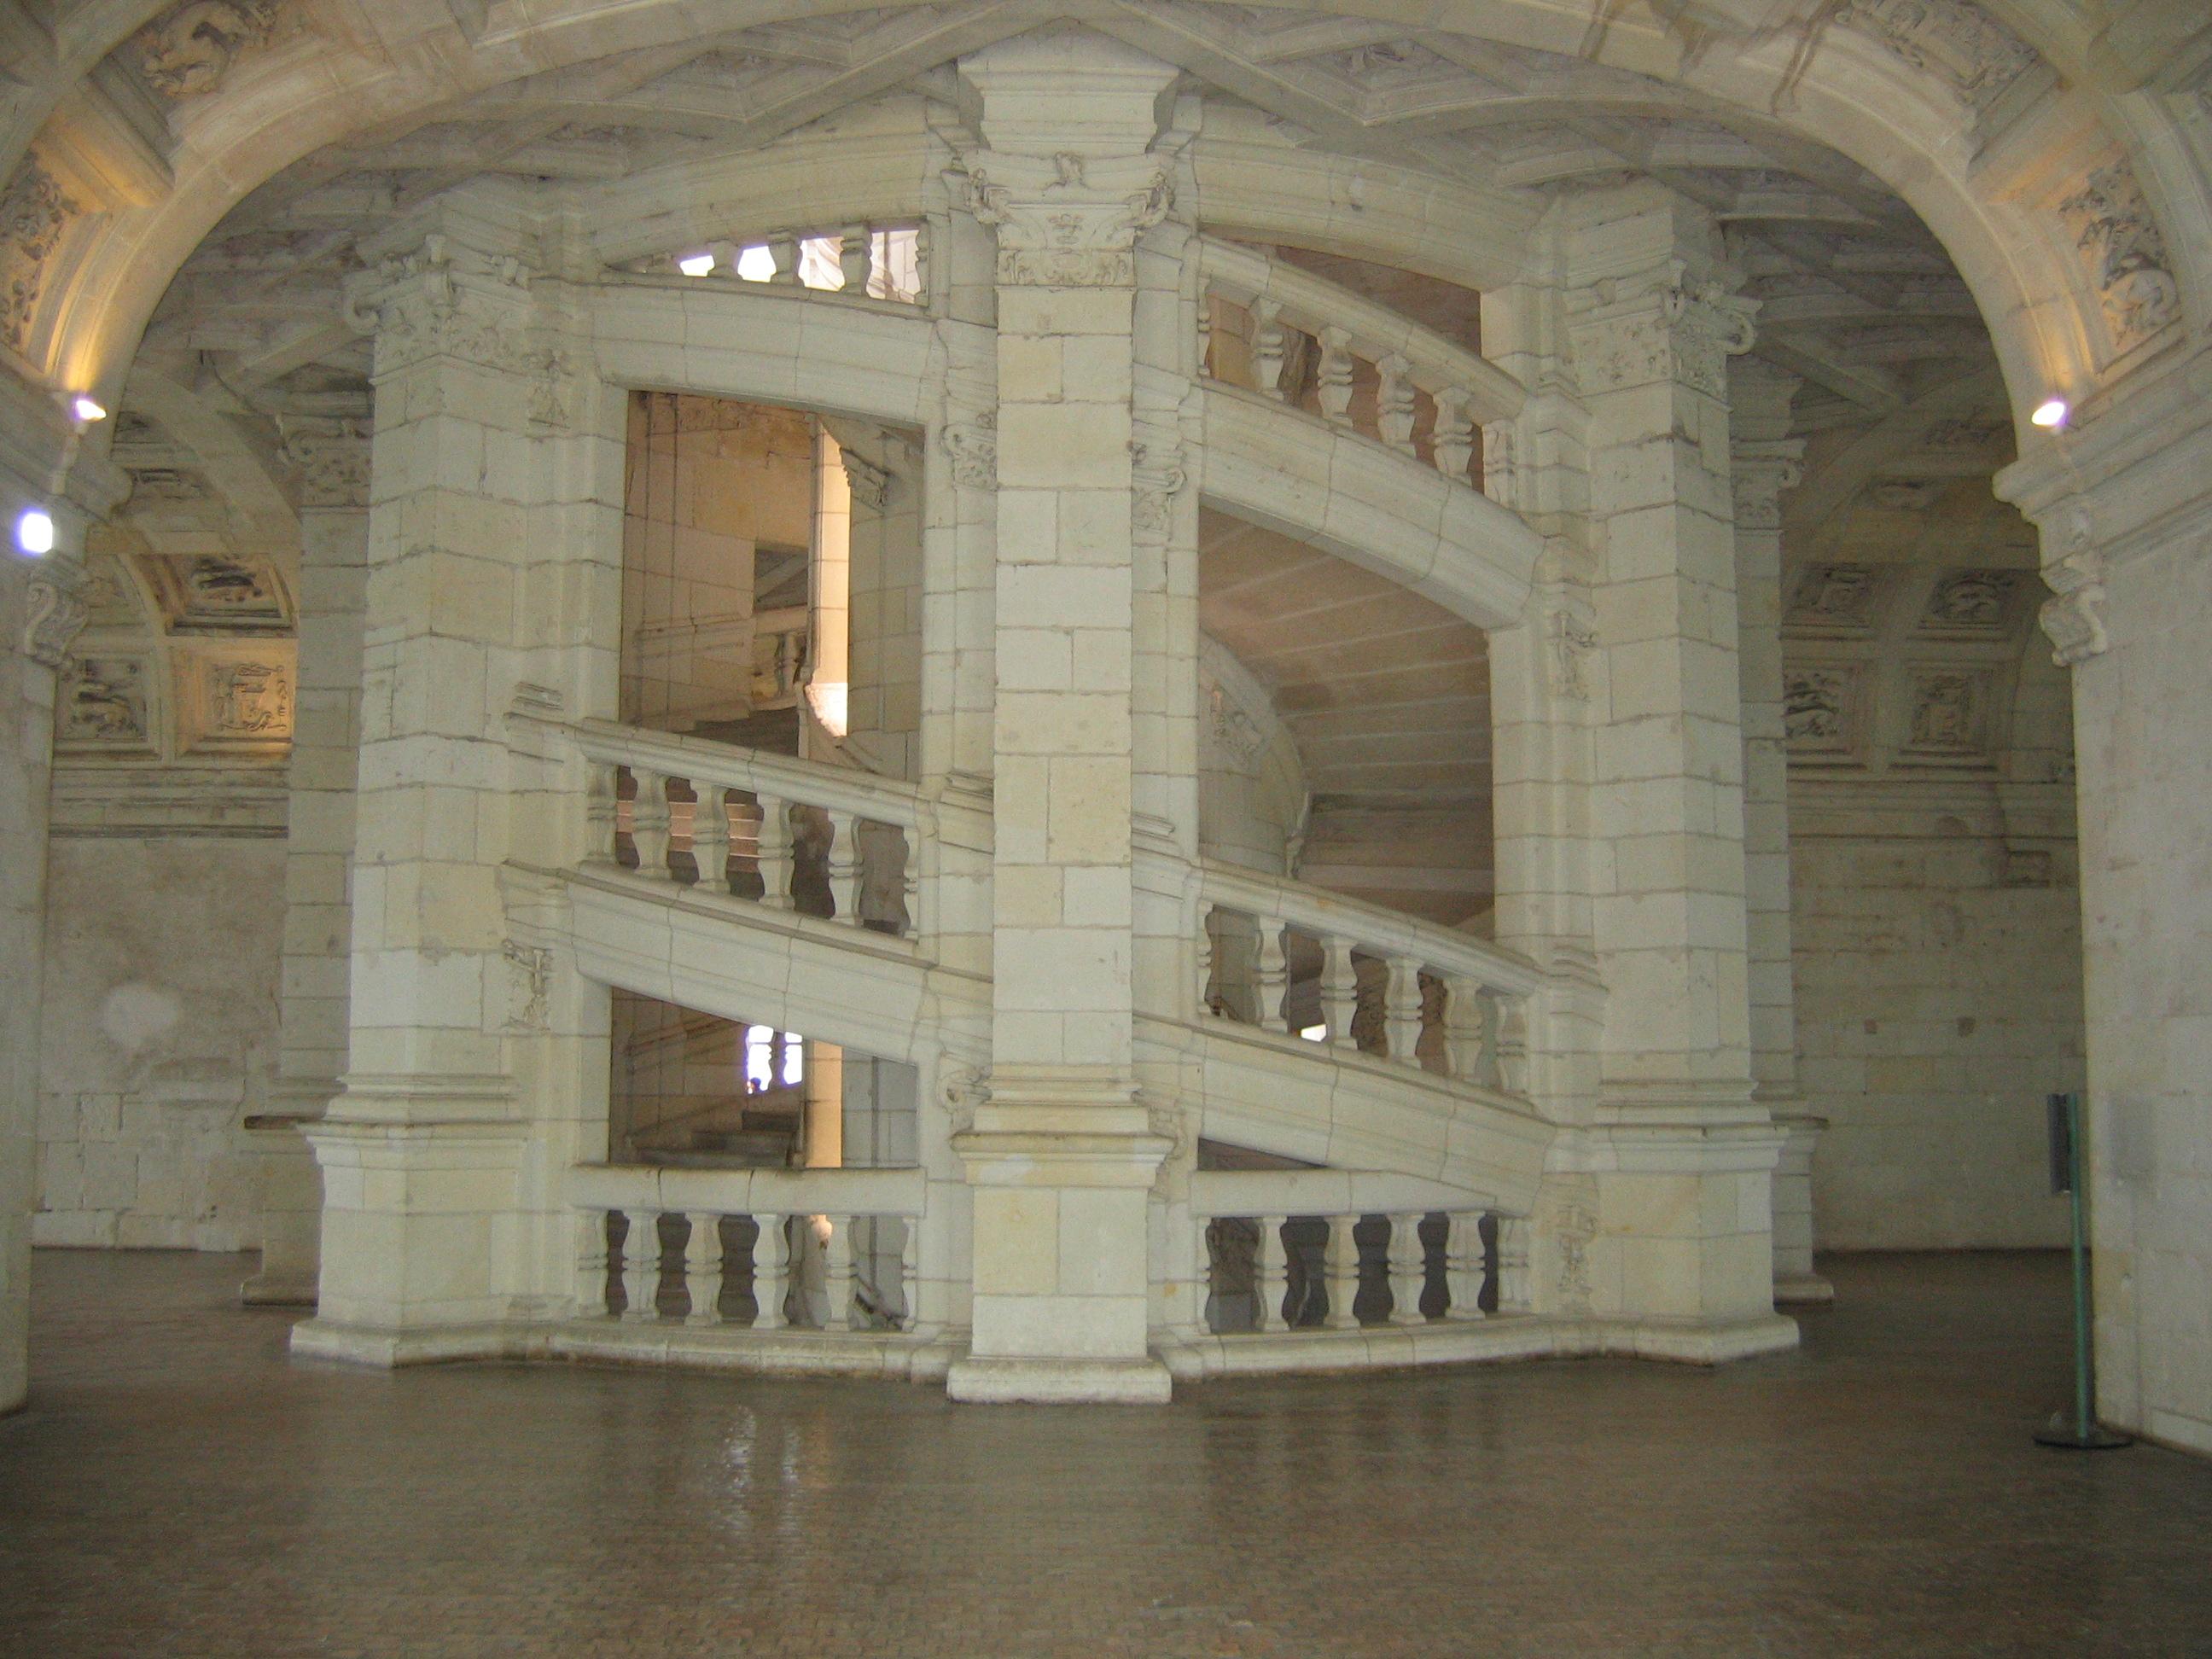 Escalier Chambord.jpg